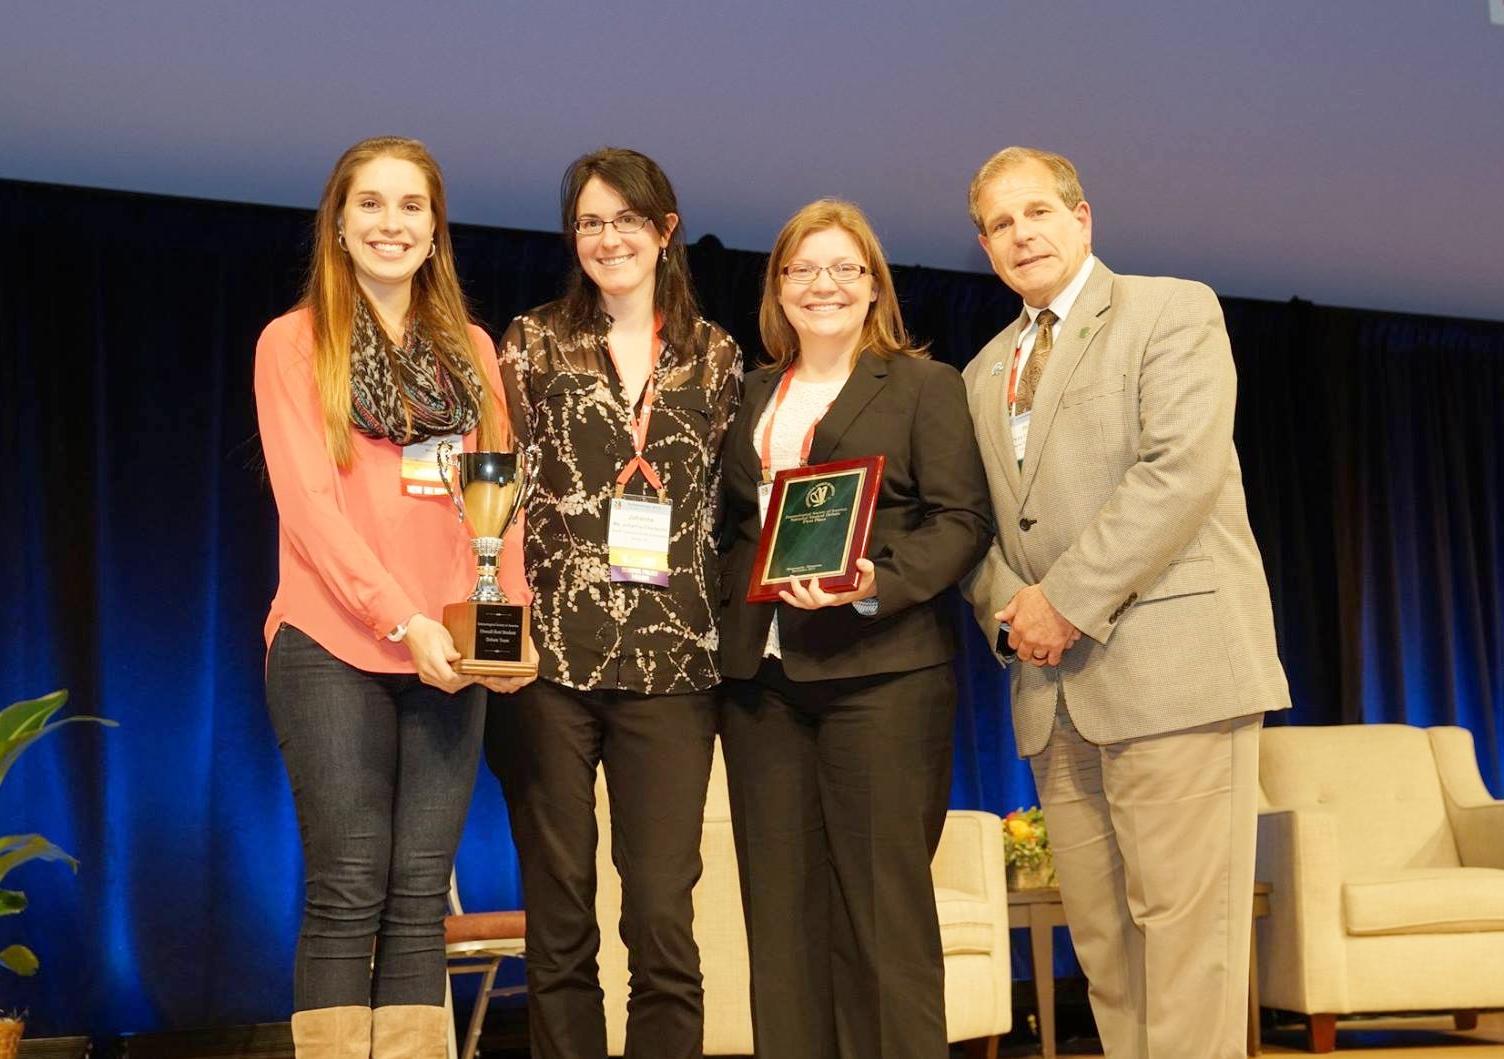 Pictured (L-R): Sophia Webster, Johanna Elsensohn, Jennifer Baltzegar, Dr. Philip Mulder (2015 ESA President)